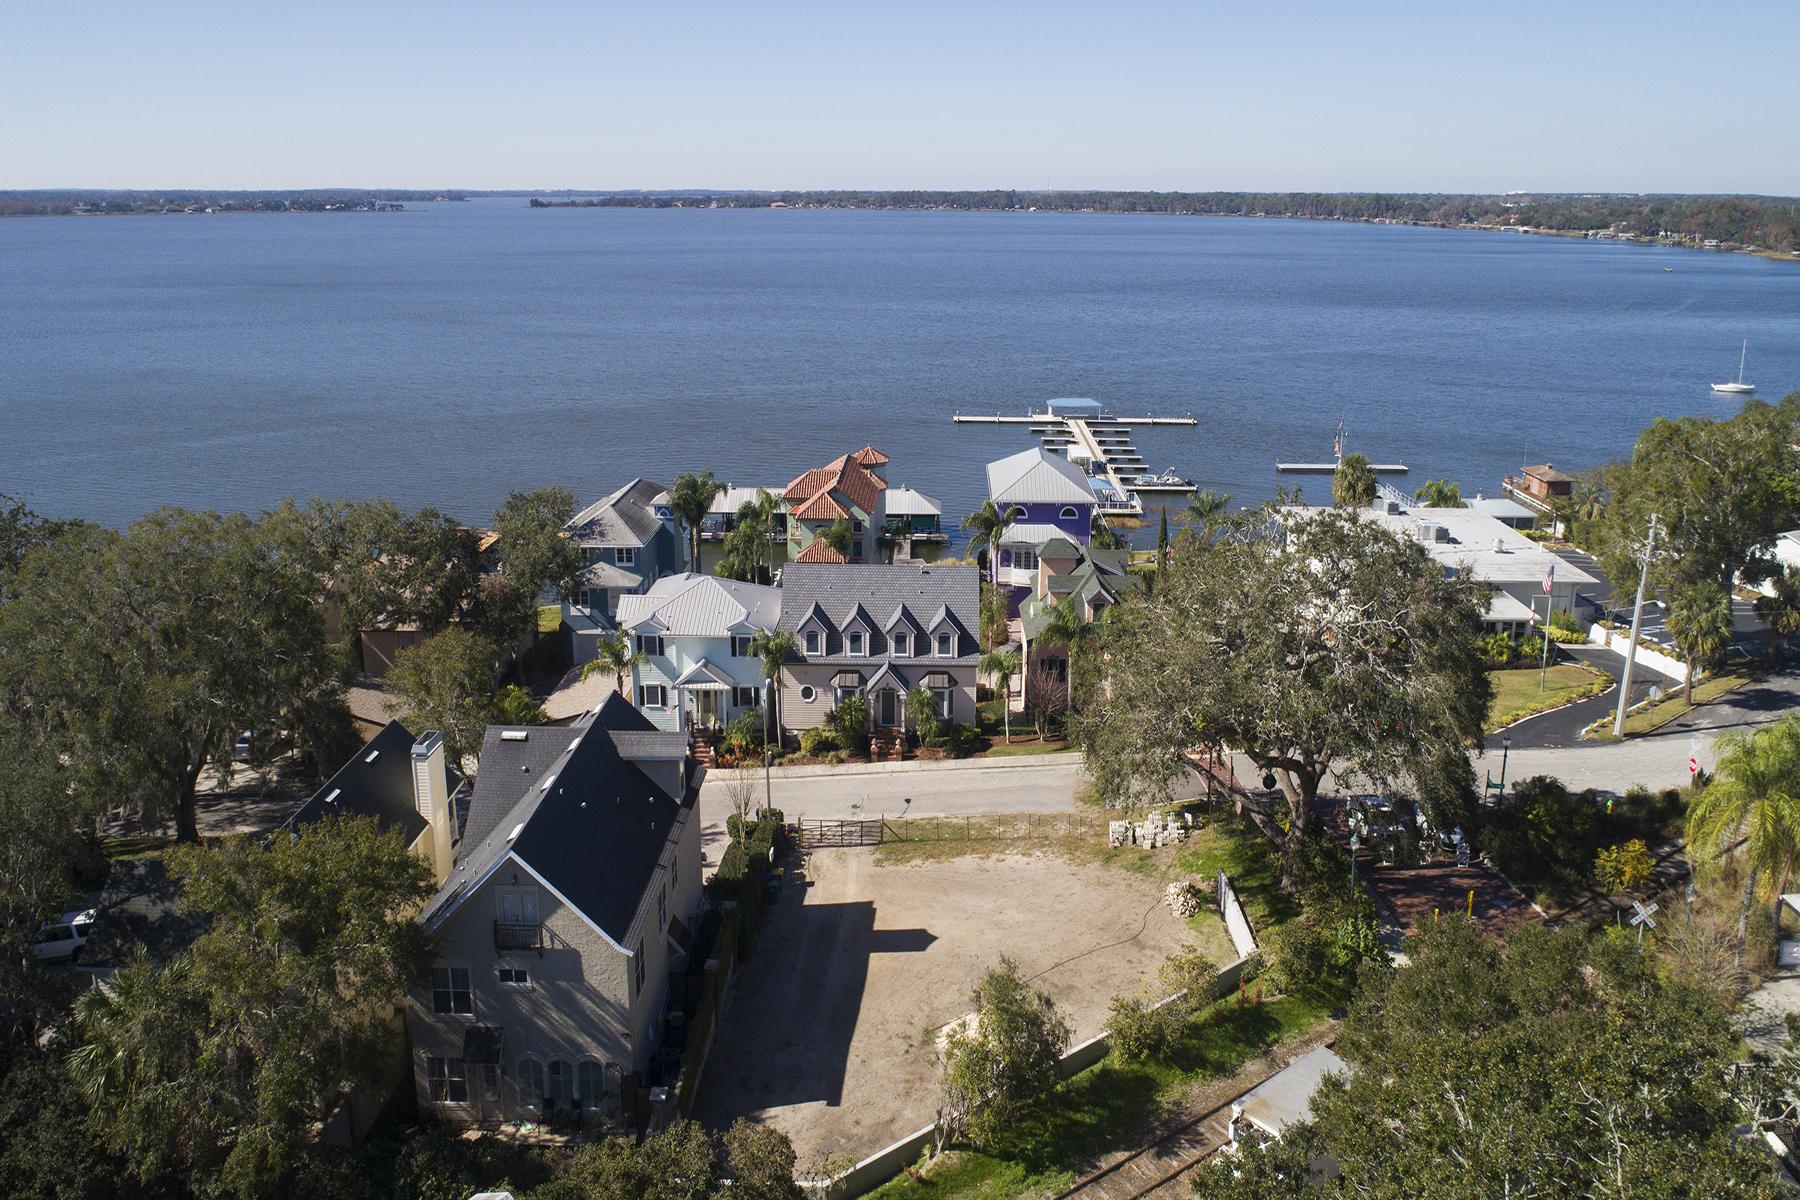 Land for Sale at ORLANDO - MOUNT DORA 380 Mcdonald St 11, Mount Dora, Florida, 32757 United States